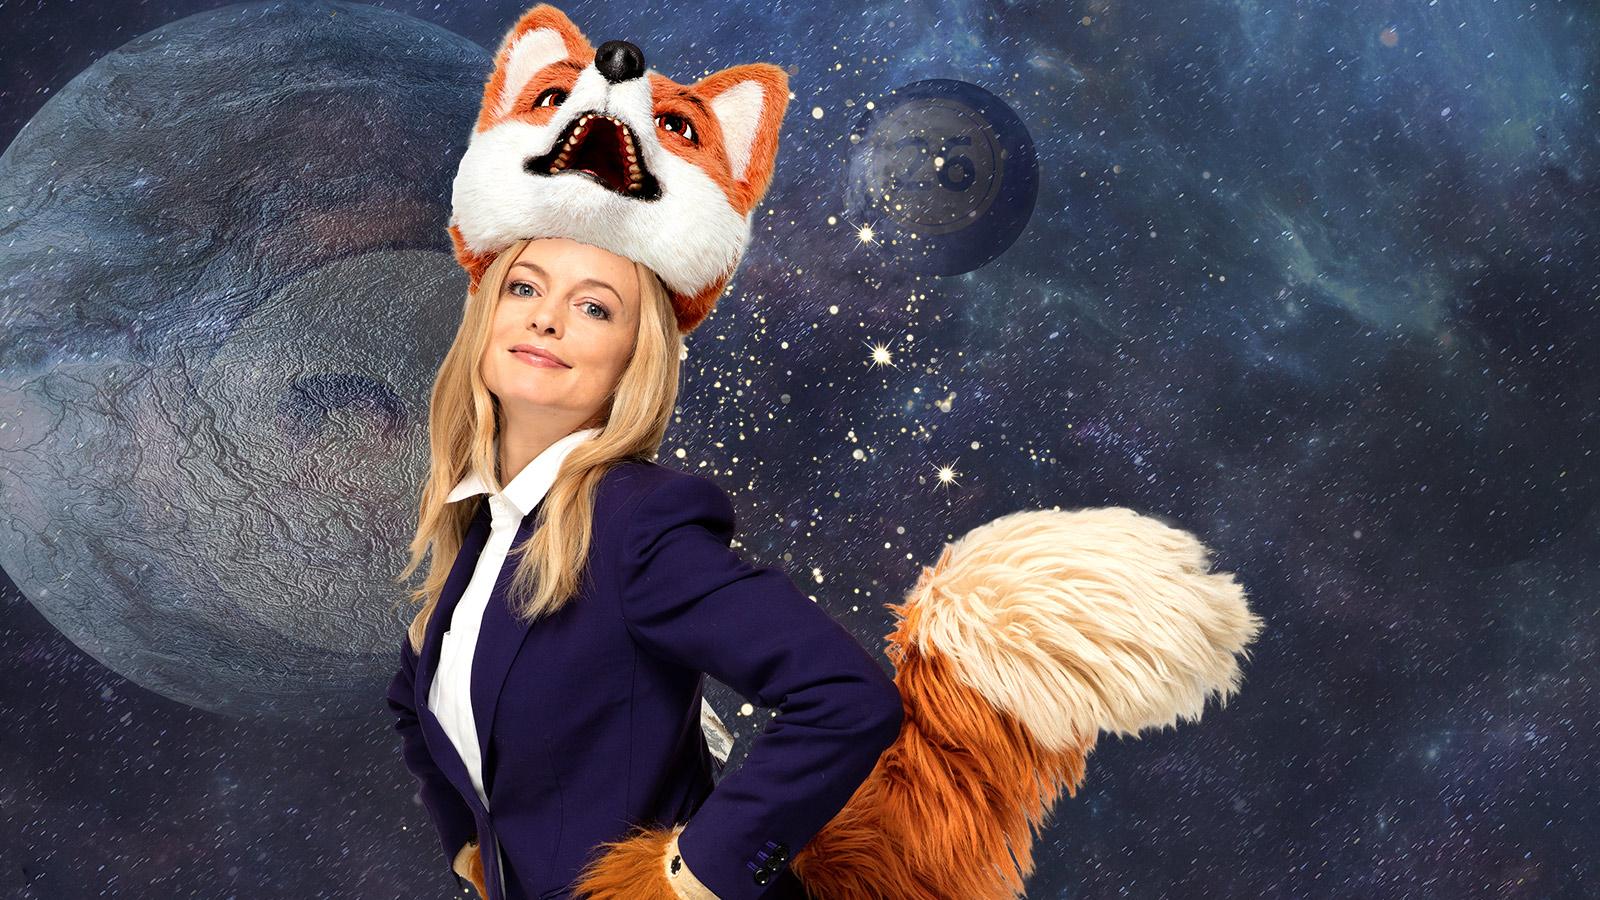 Heather Graham wearing Paul Smith for Foxy Bingo marketing campaign / Source: Foxy Bingo